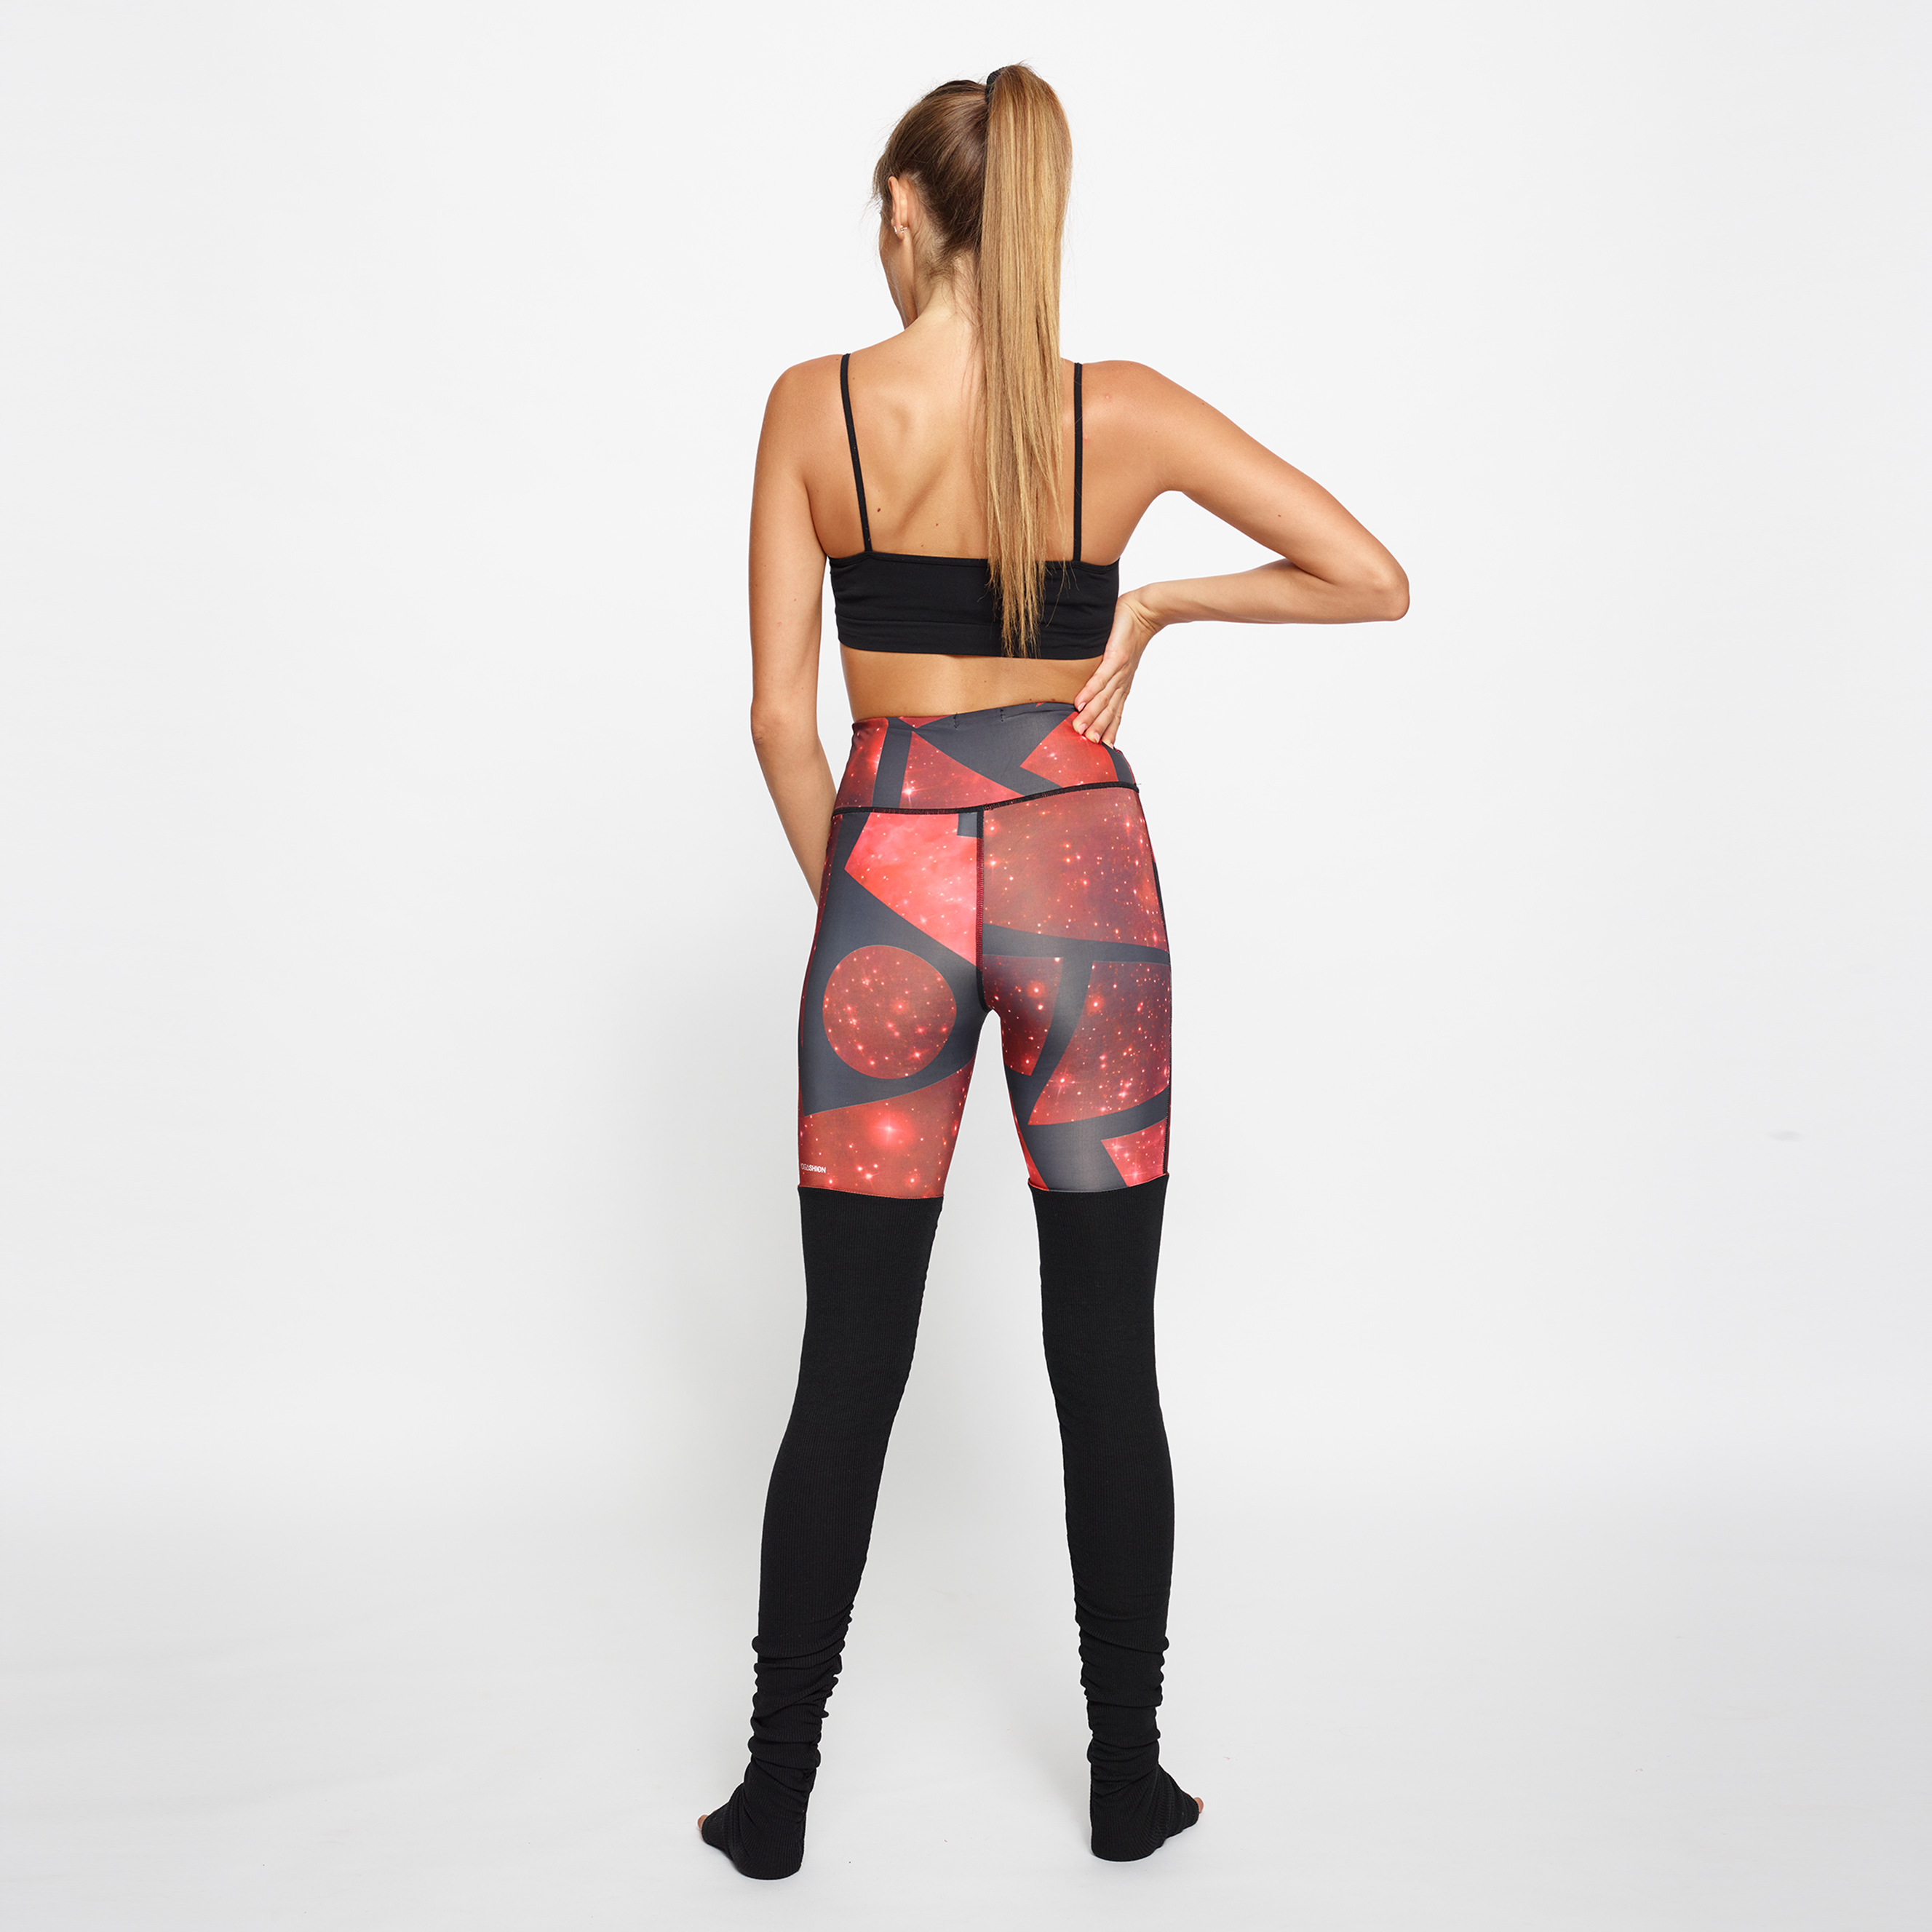 leggings fitness Yogashion stampa cosmo